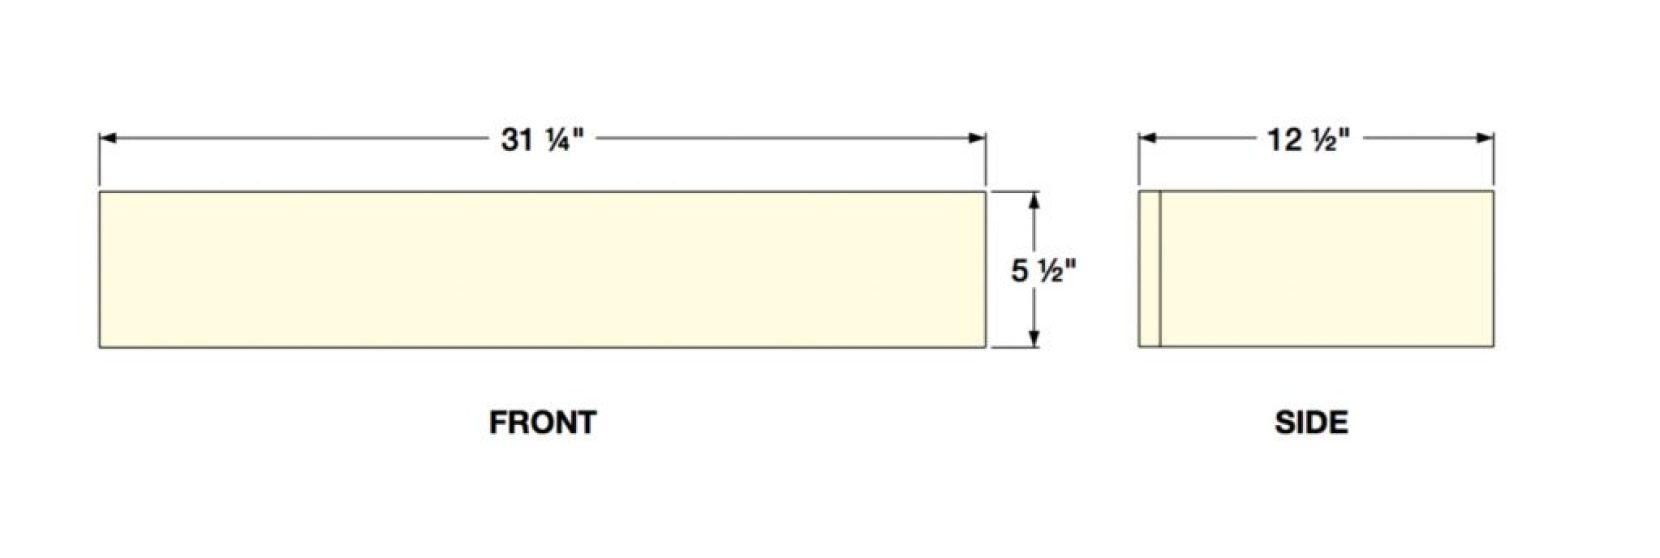 Dimensions of Floating Shelf